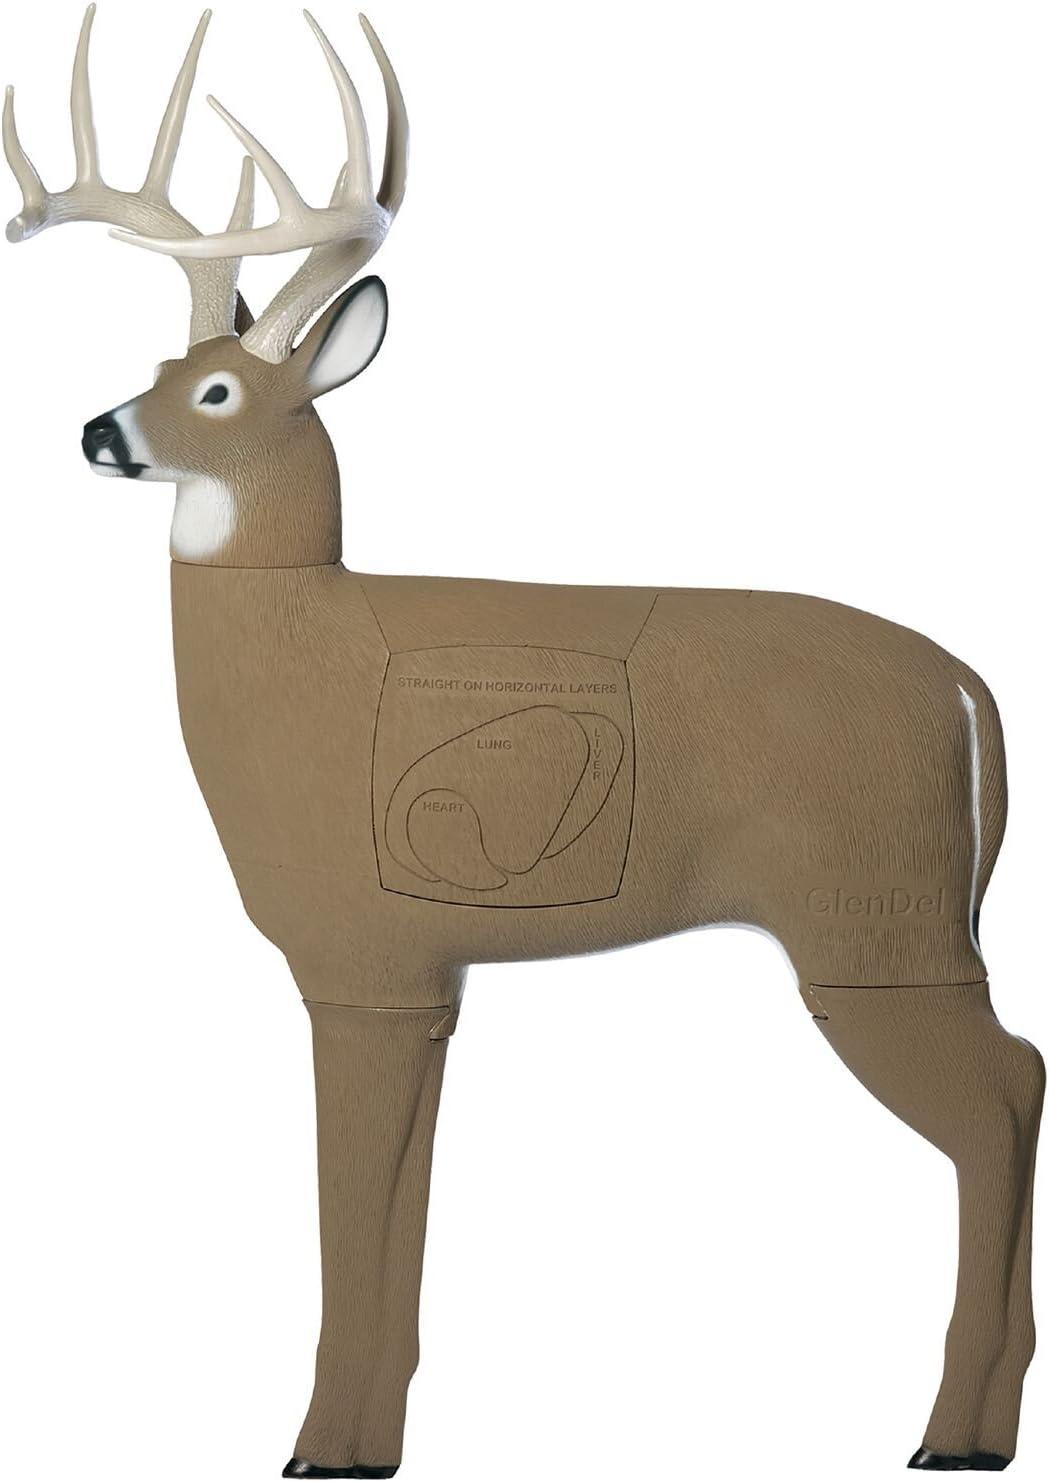 GlenDel Crossbow Buck 3dアーチェリーターゲットの交換可能なコア